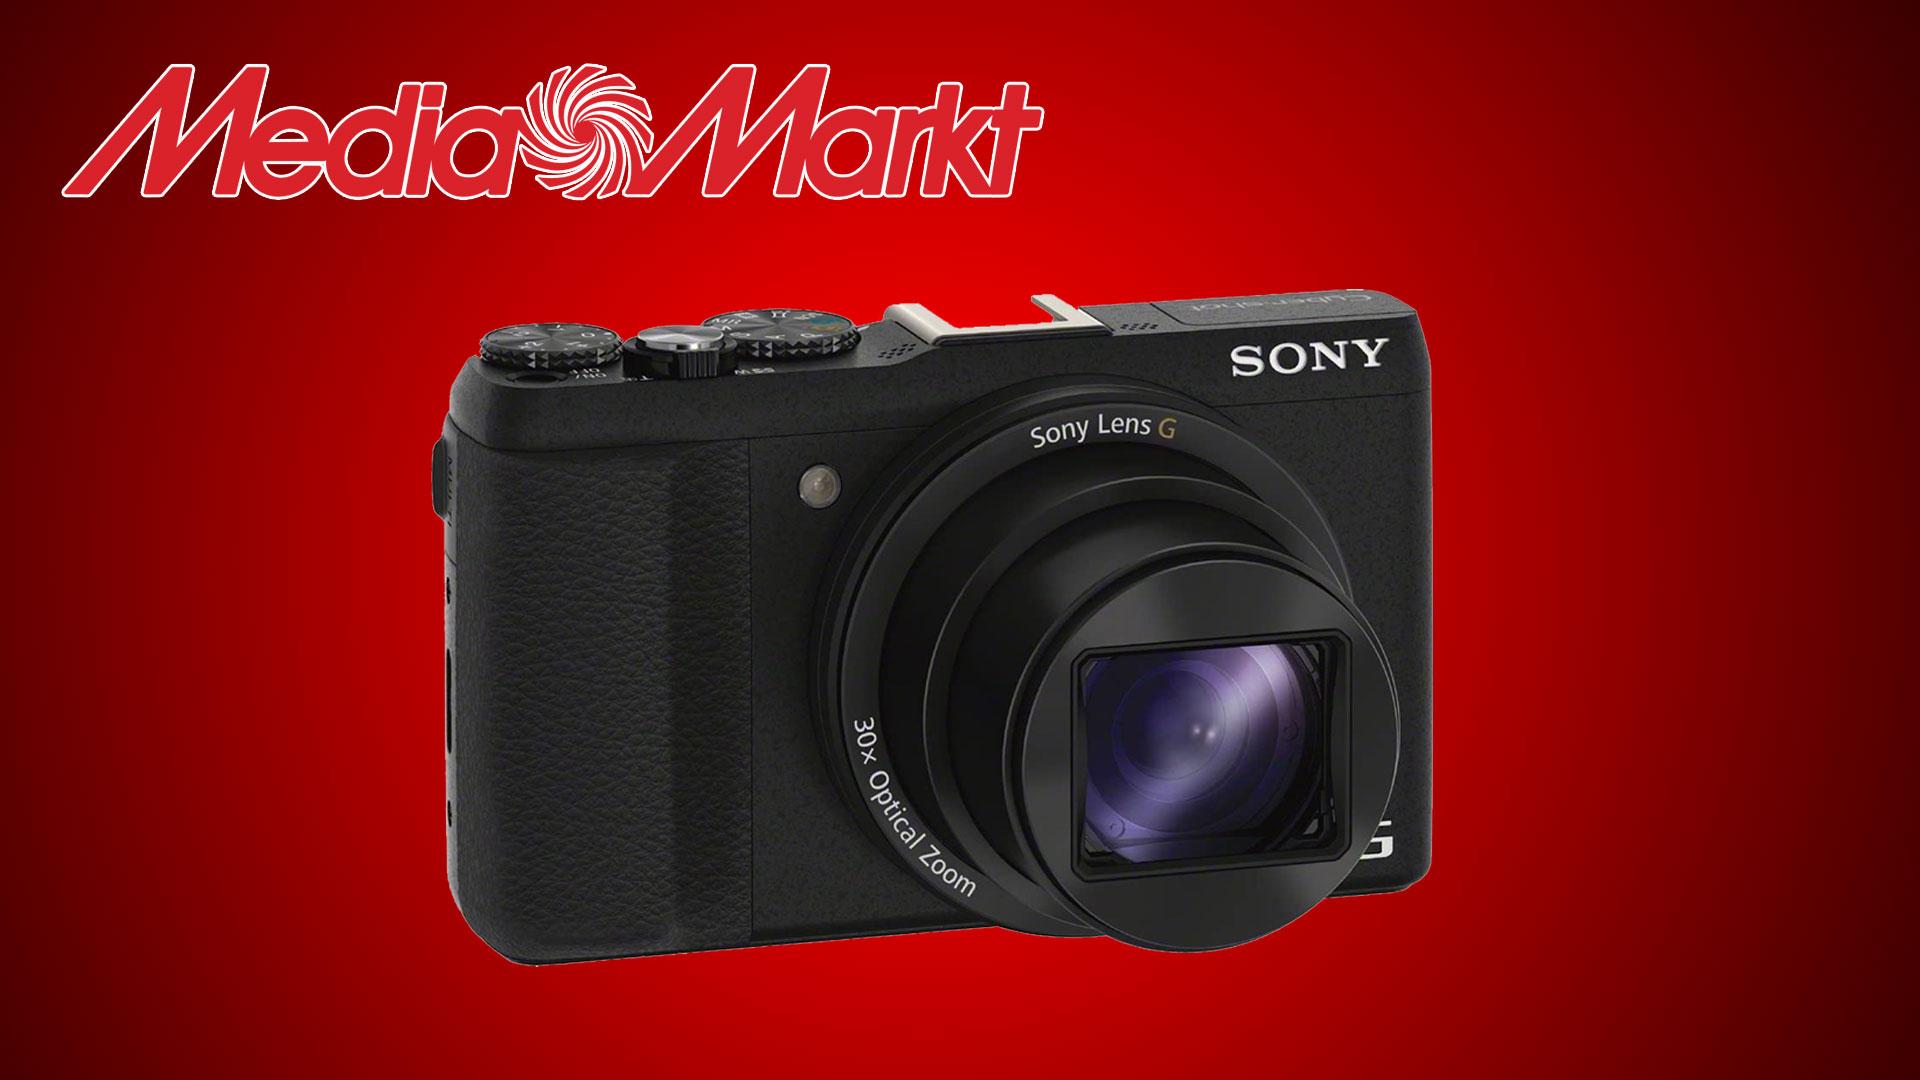 Media Markt: Digitalkamera von Sony zum Spitzenpreis